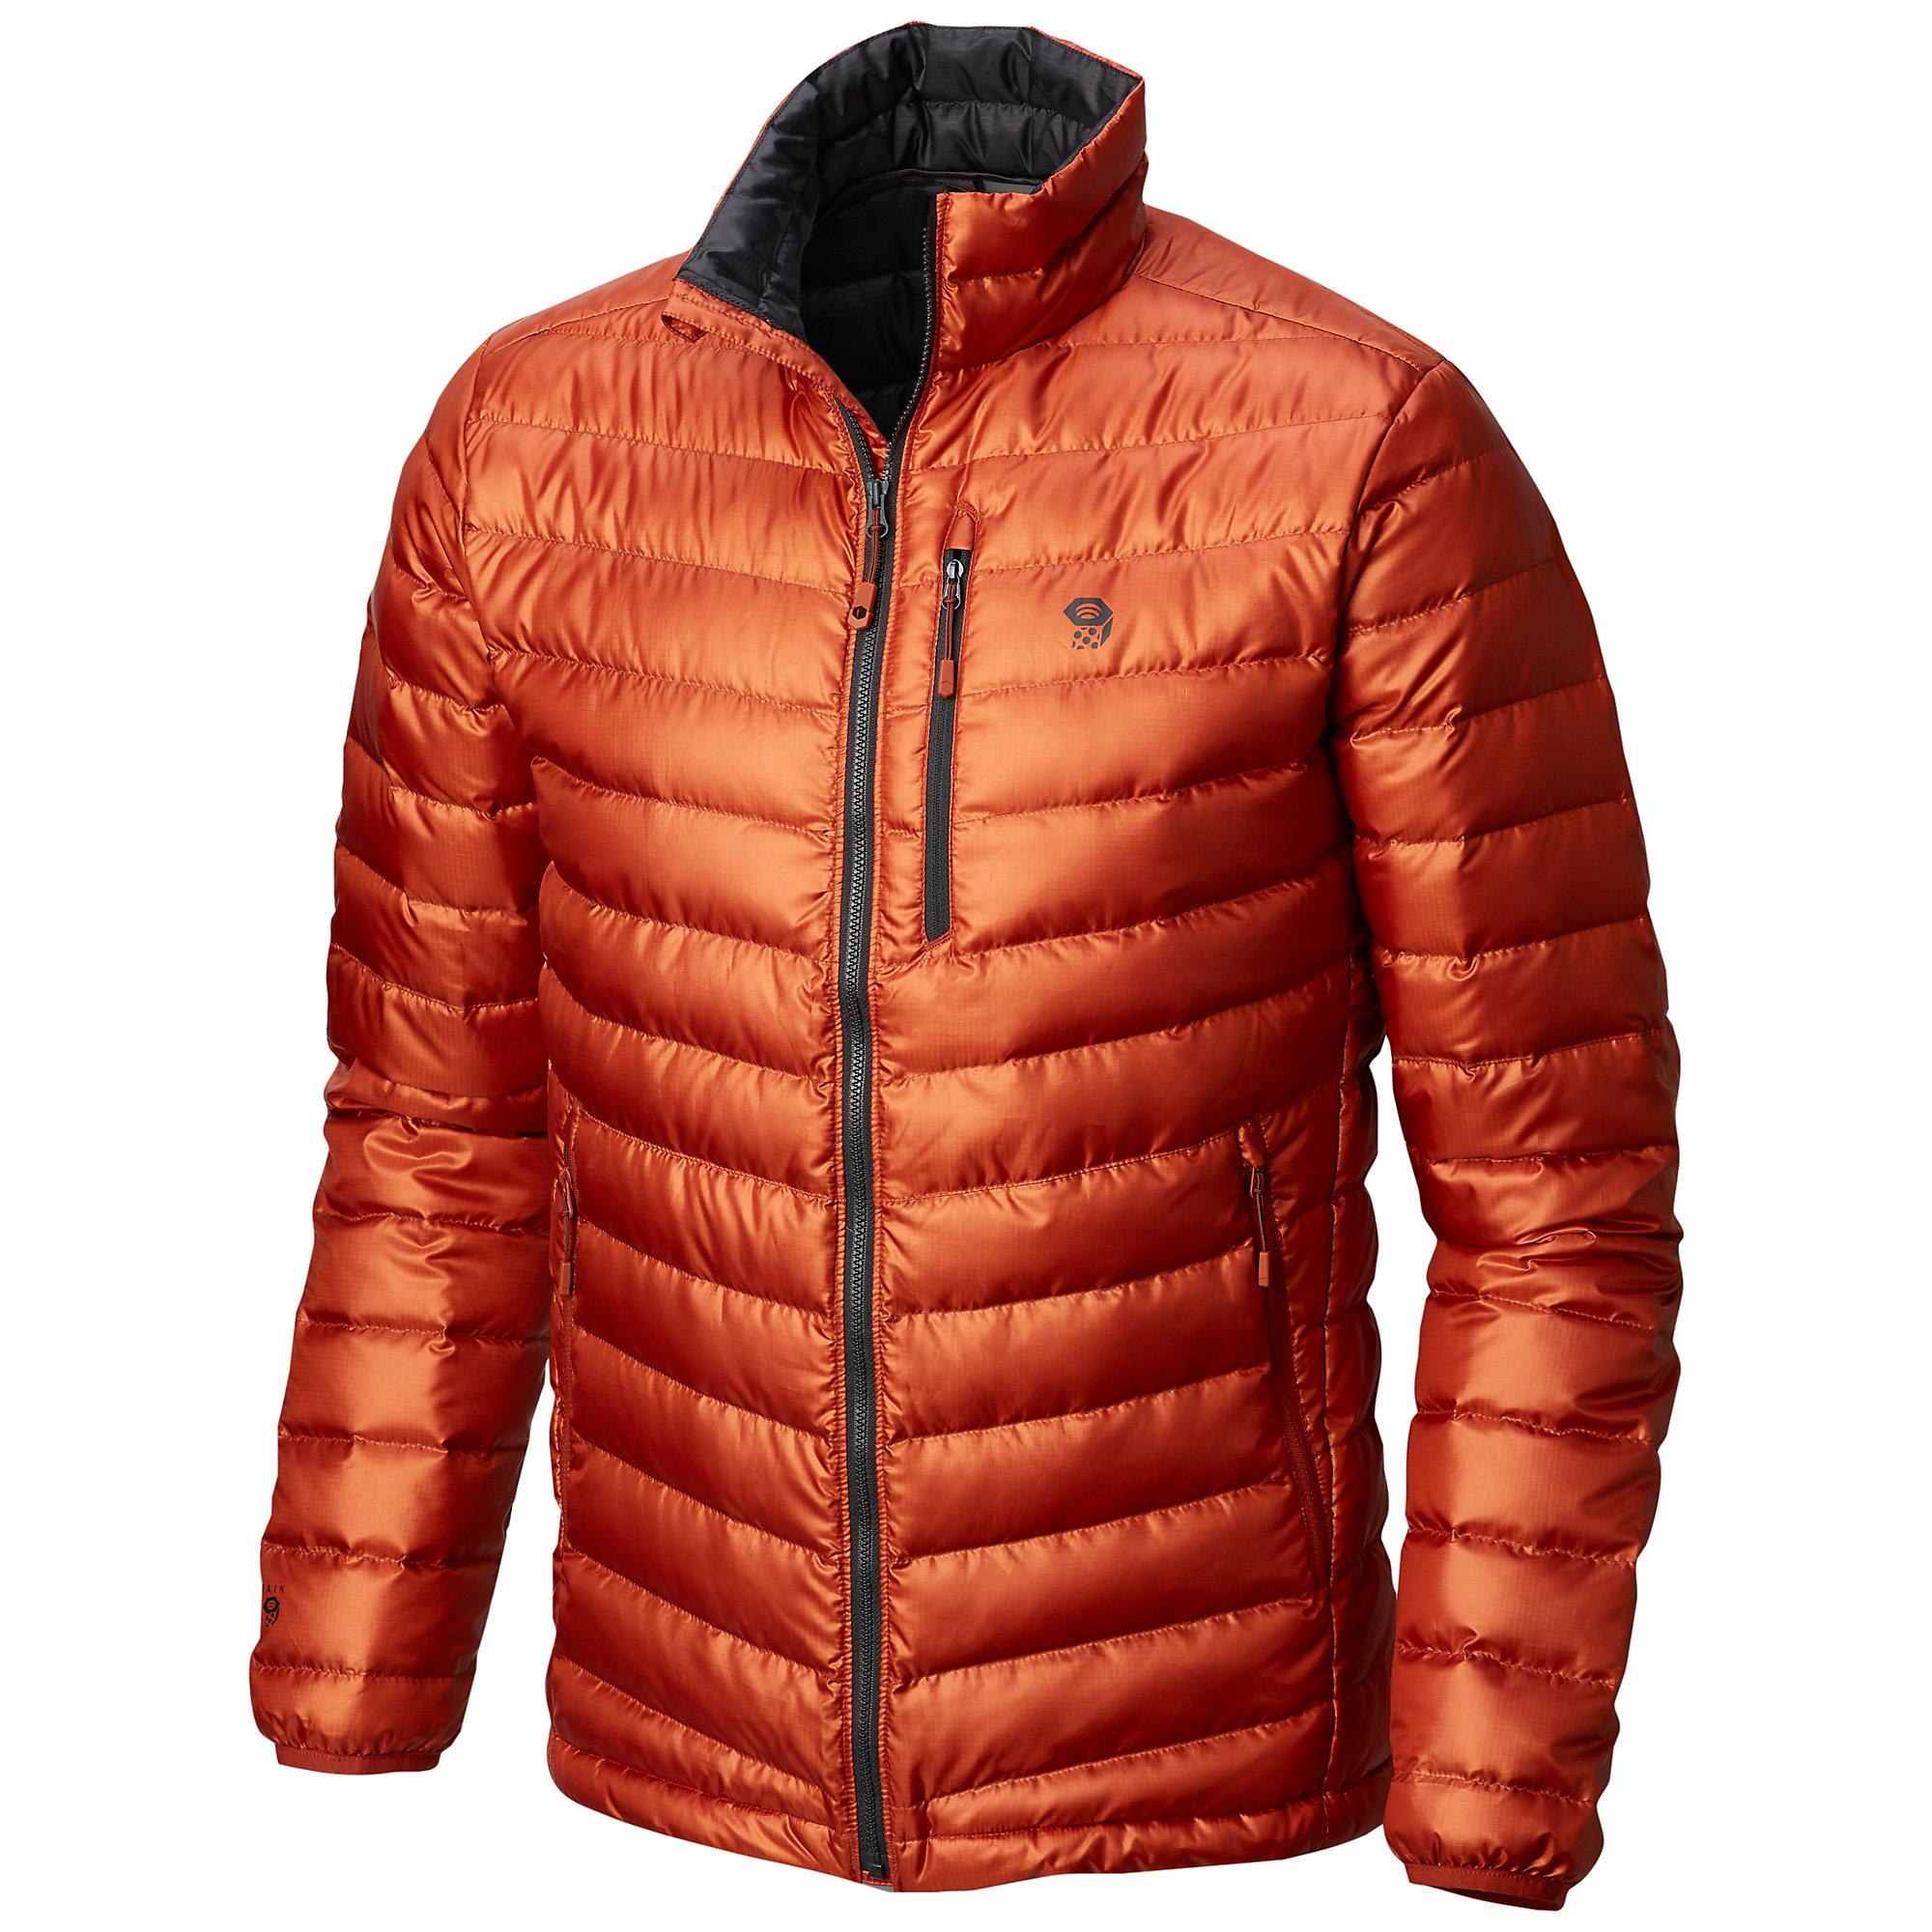 Mountain Hardwear Nitrous Down Jacket